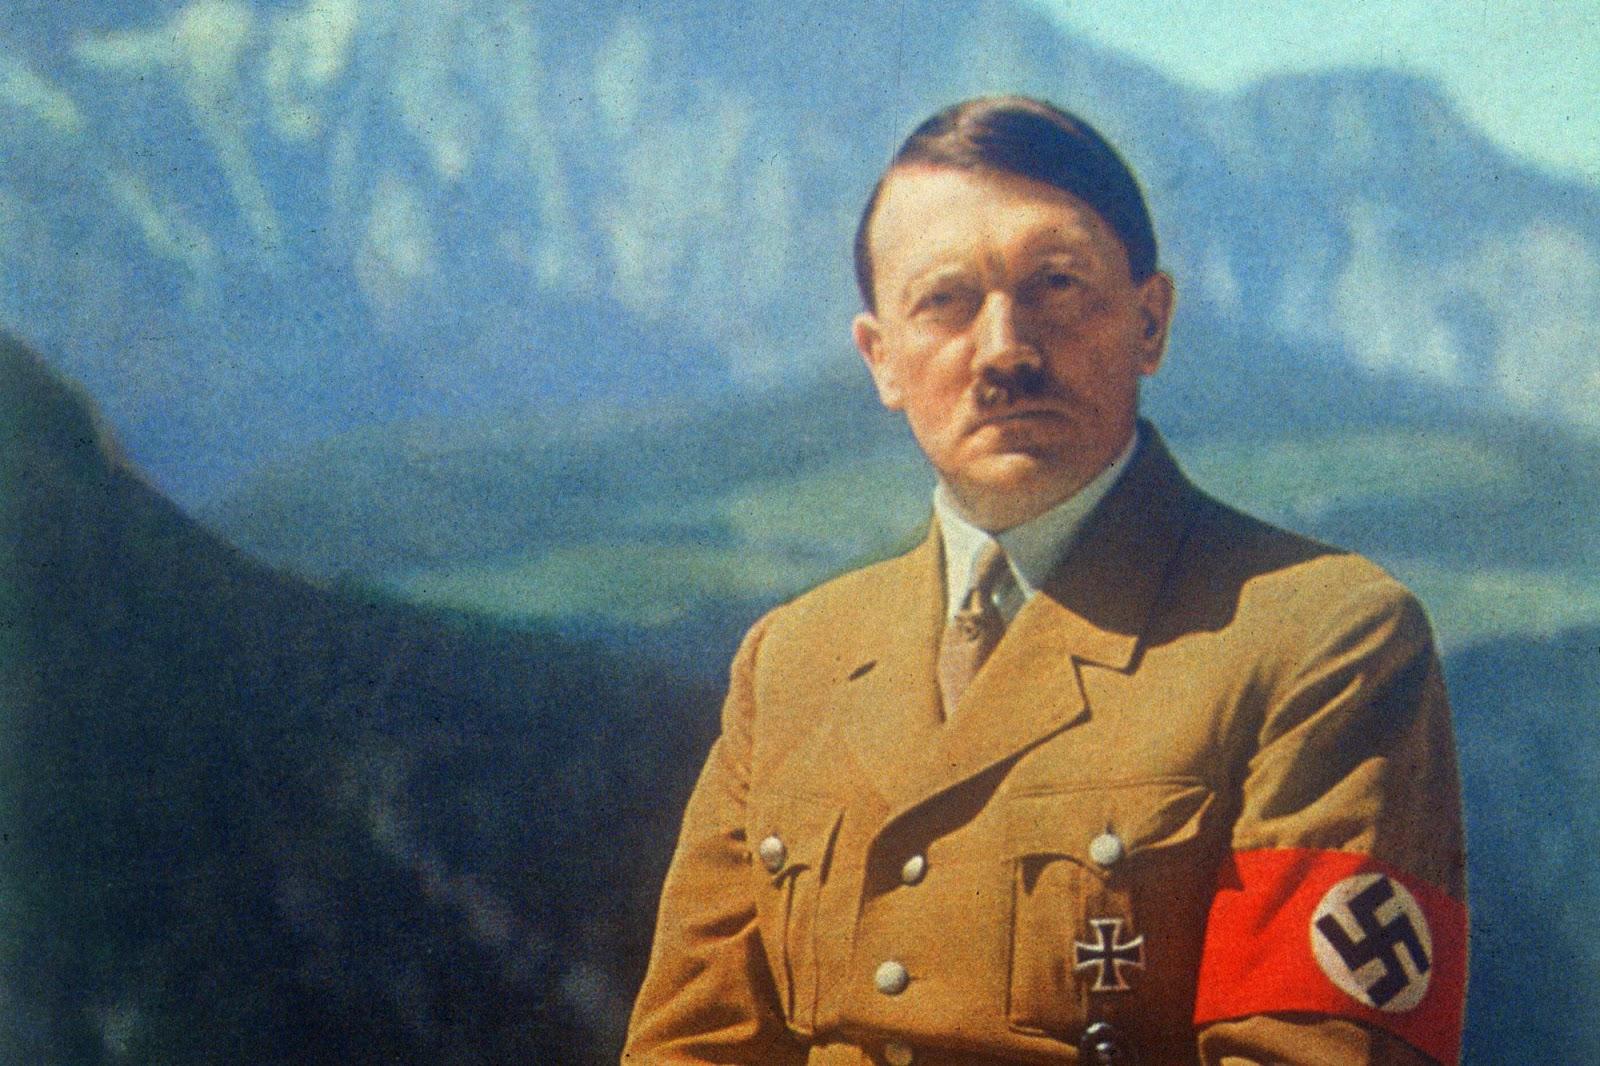 Adolf Hitler Di Makamkan di Surabaya Dan Masuk Islam Sebelum Kematiannya